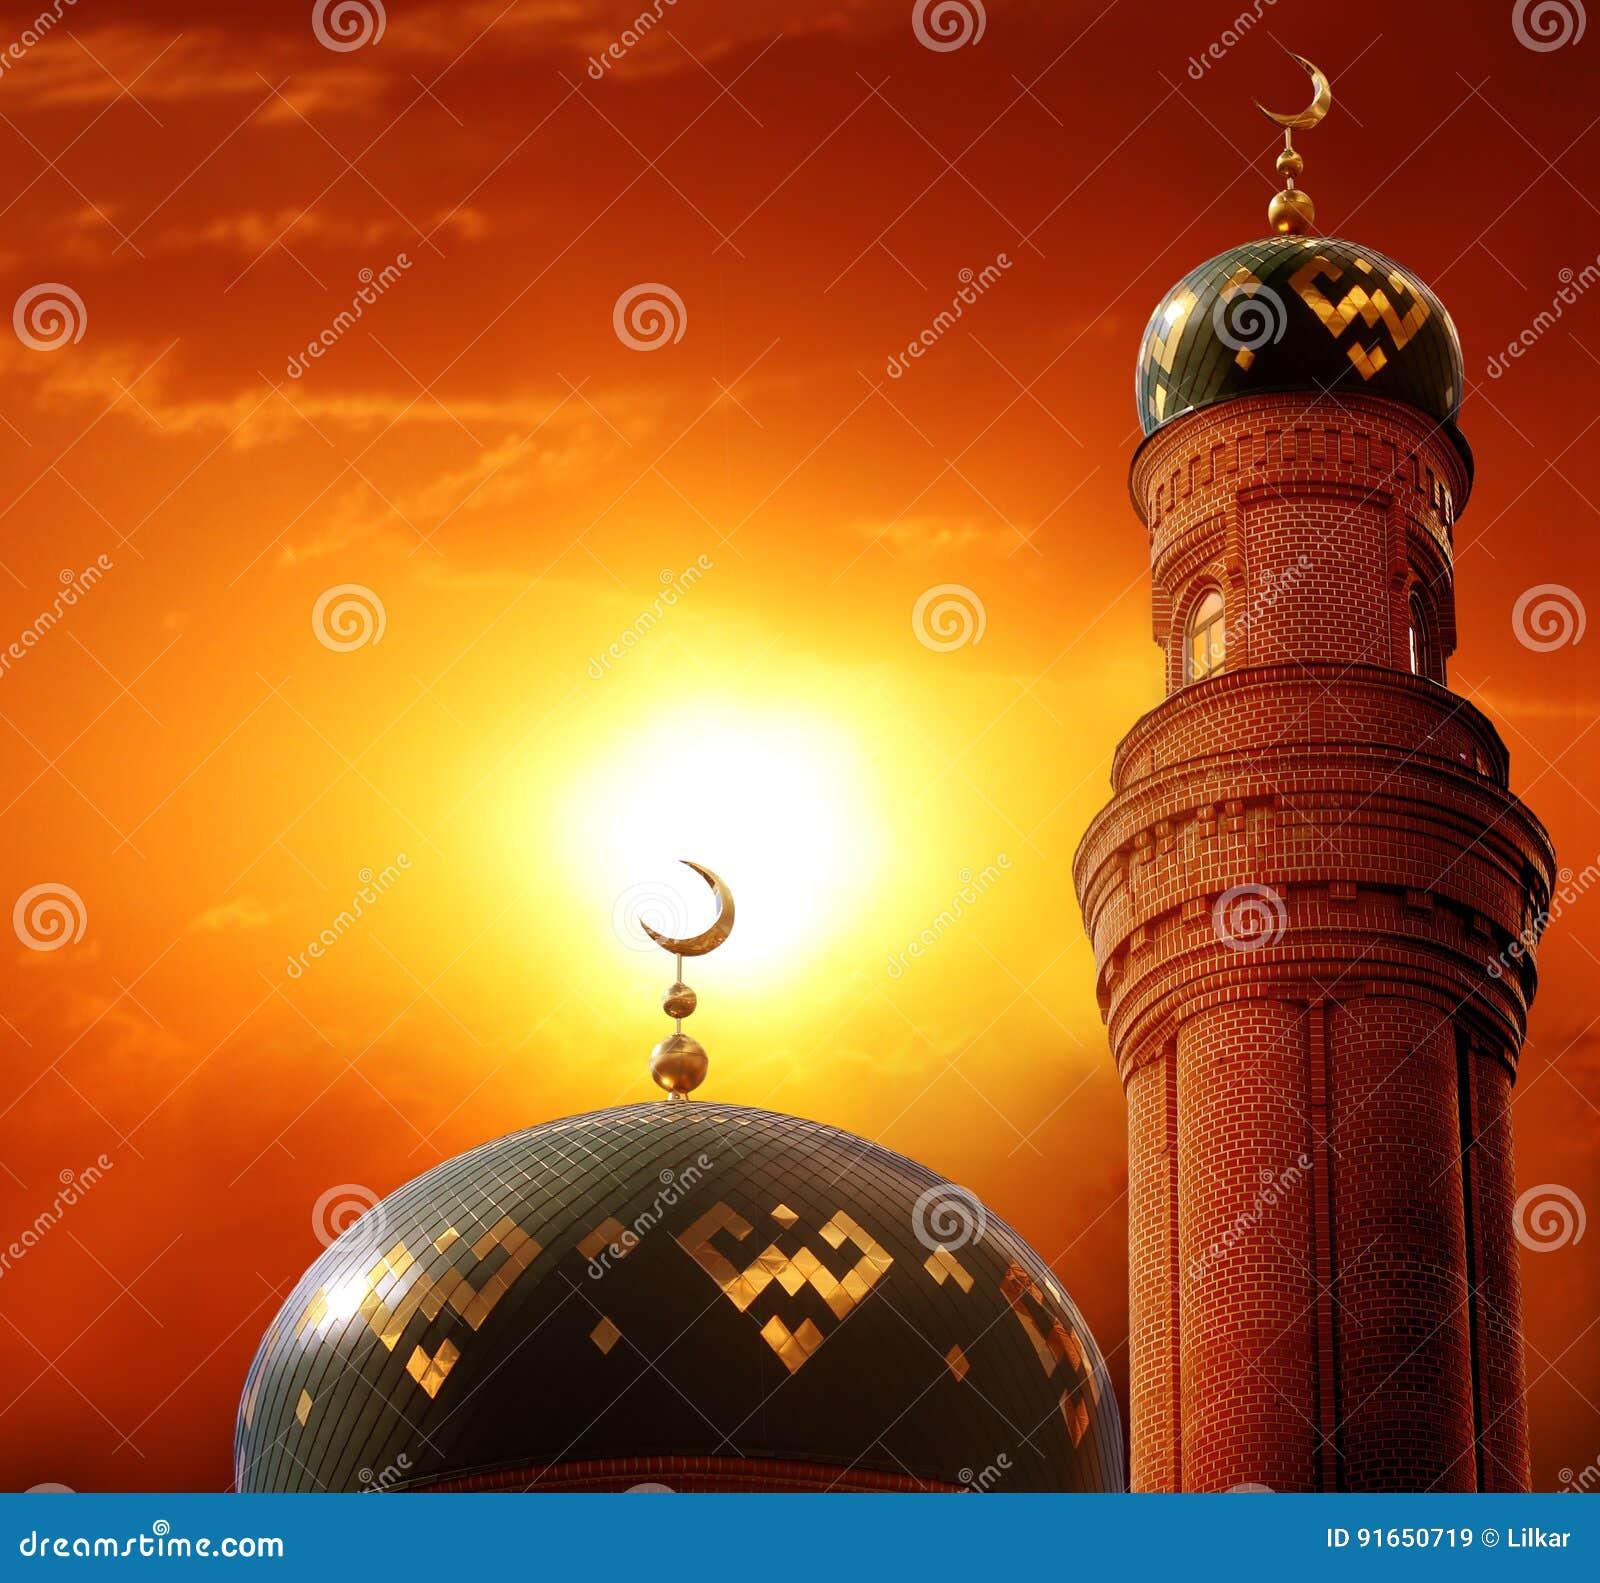 Mosque background for ramadan kareem stock photography image - Ramadan Kareem Background Islamic Greeting Eid Mubarak Cards Fo Stock Photo